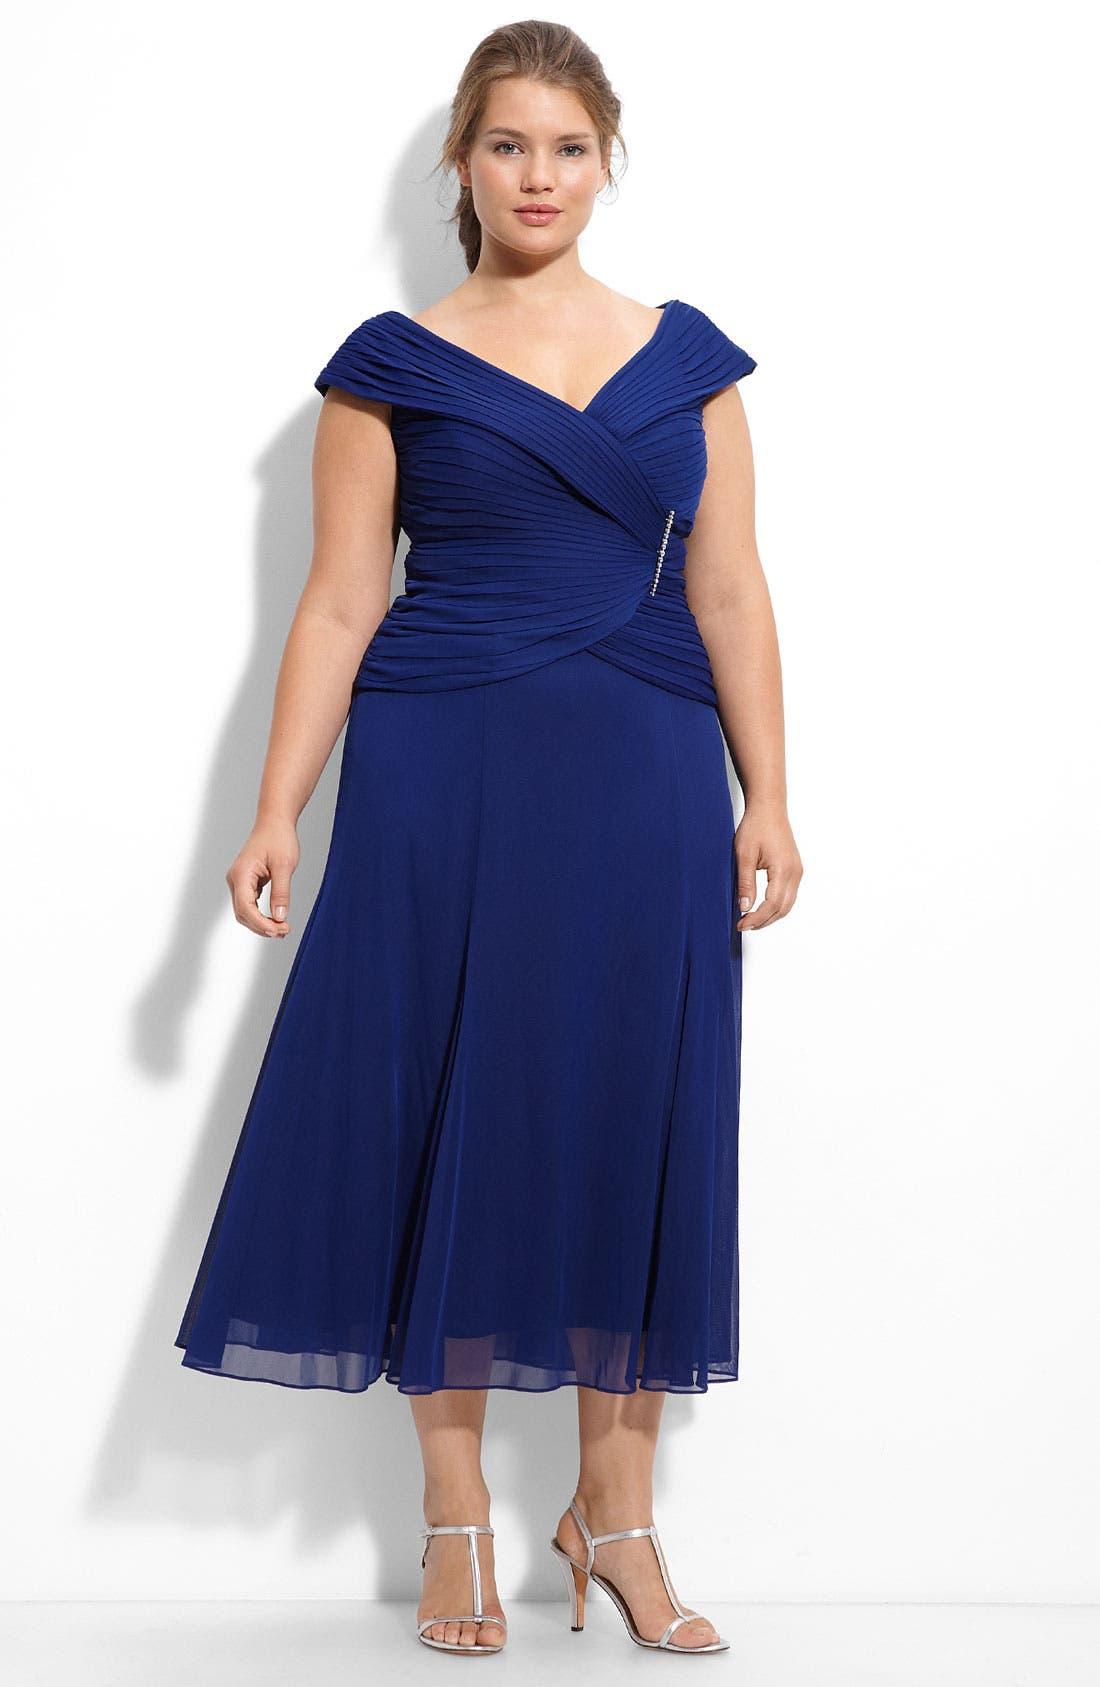 Main Image - Alex Evenings Jeweled Portrait Collar Mesh Dress (Plus)